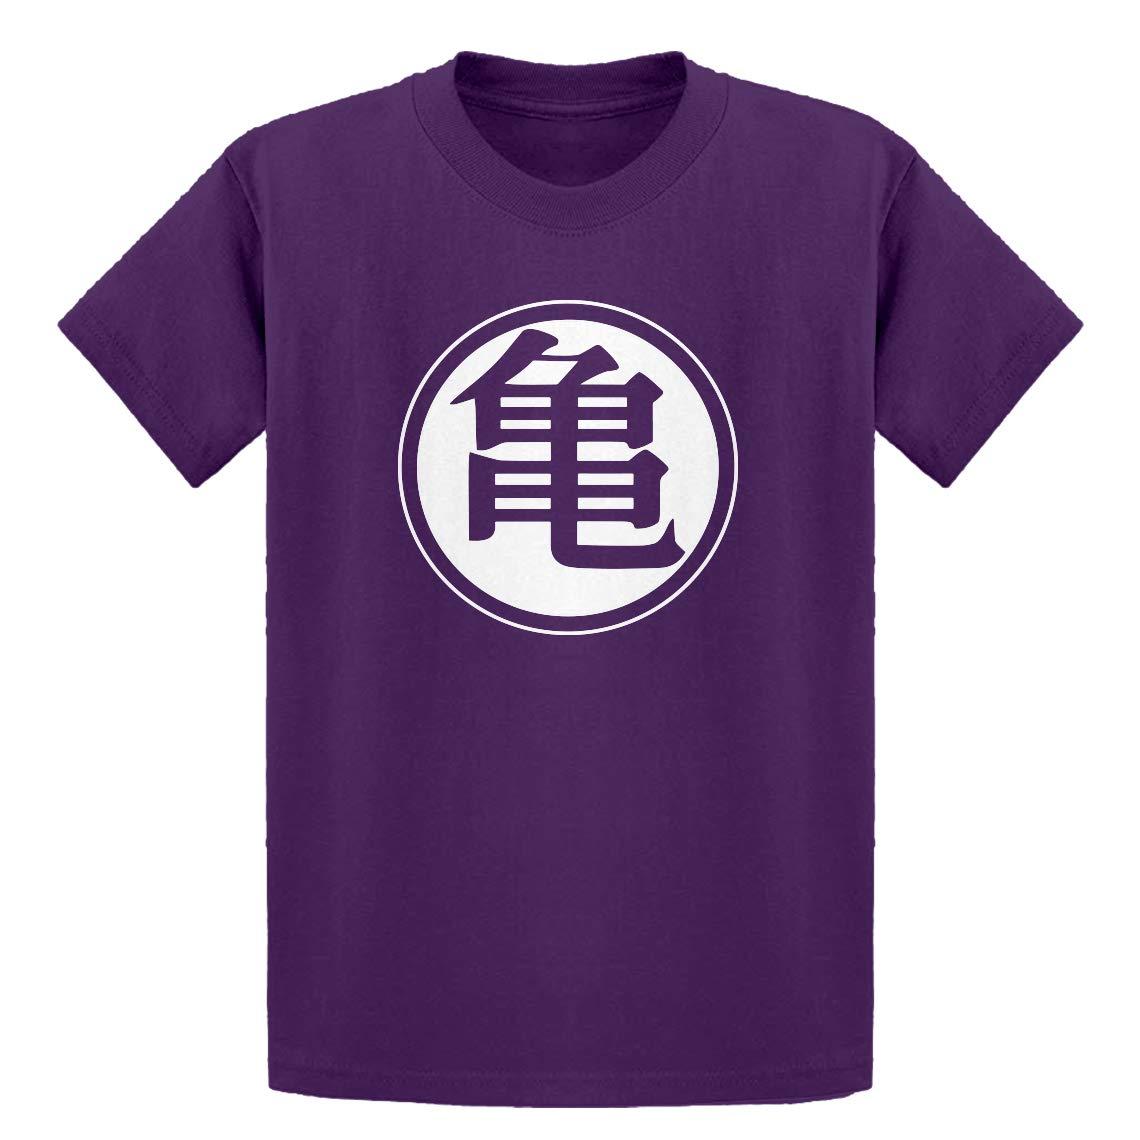 Indica Plateau Youth Kame House Turtle School Kids T-Shirt